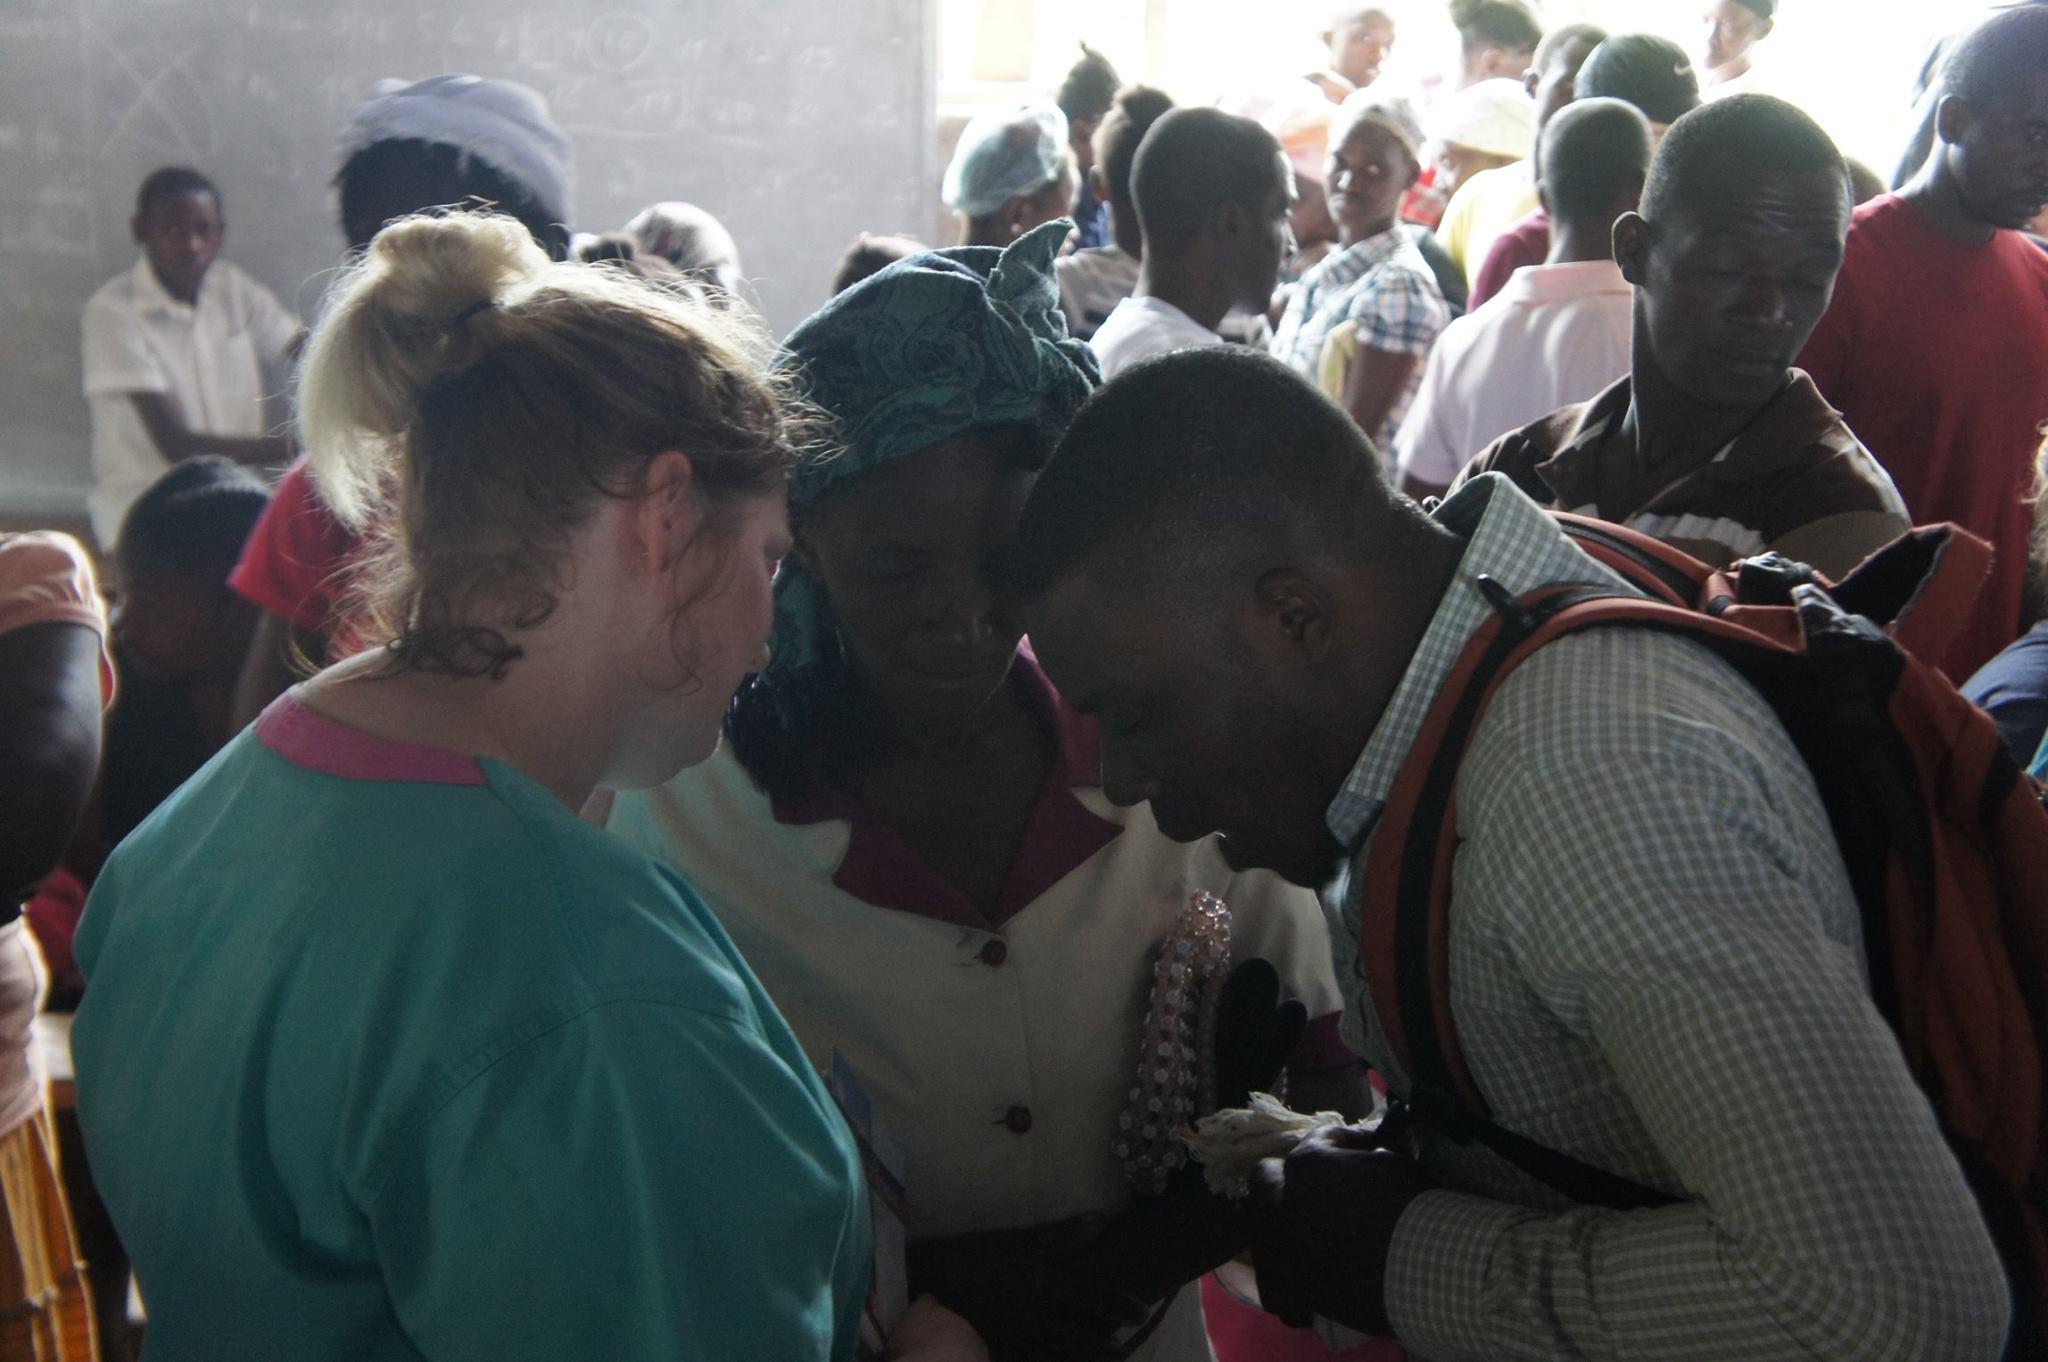 Bethesda evangelism medical clinic testimony haiti 4-17 d.jpg